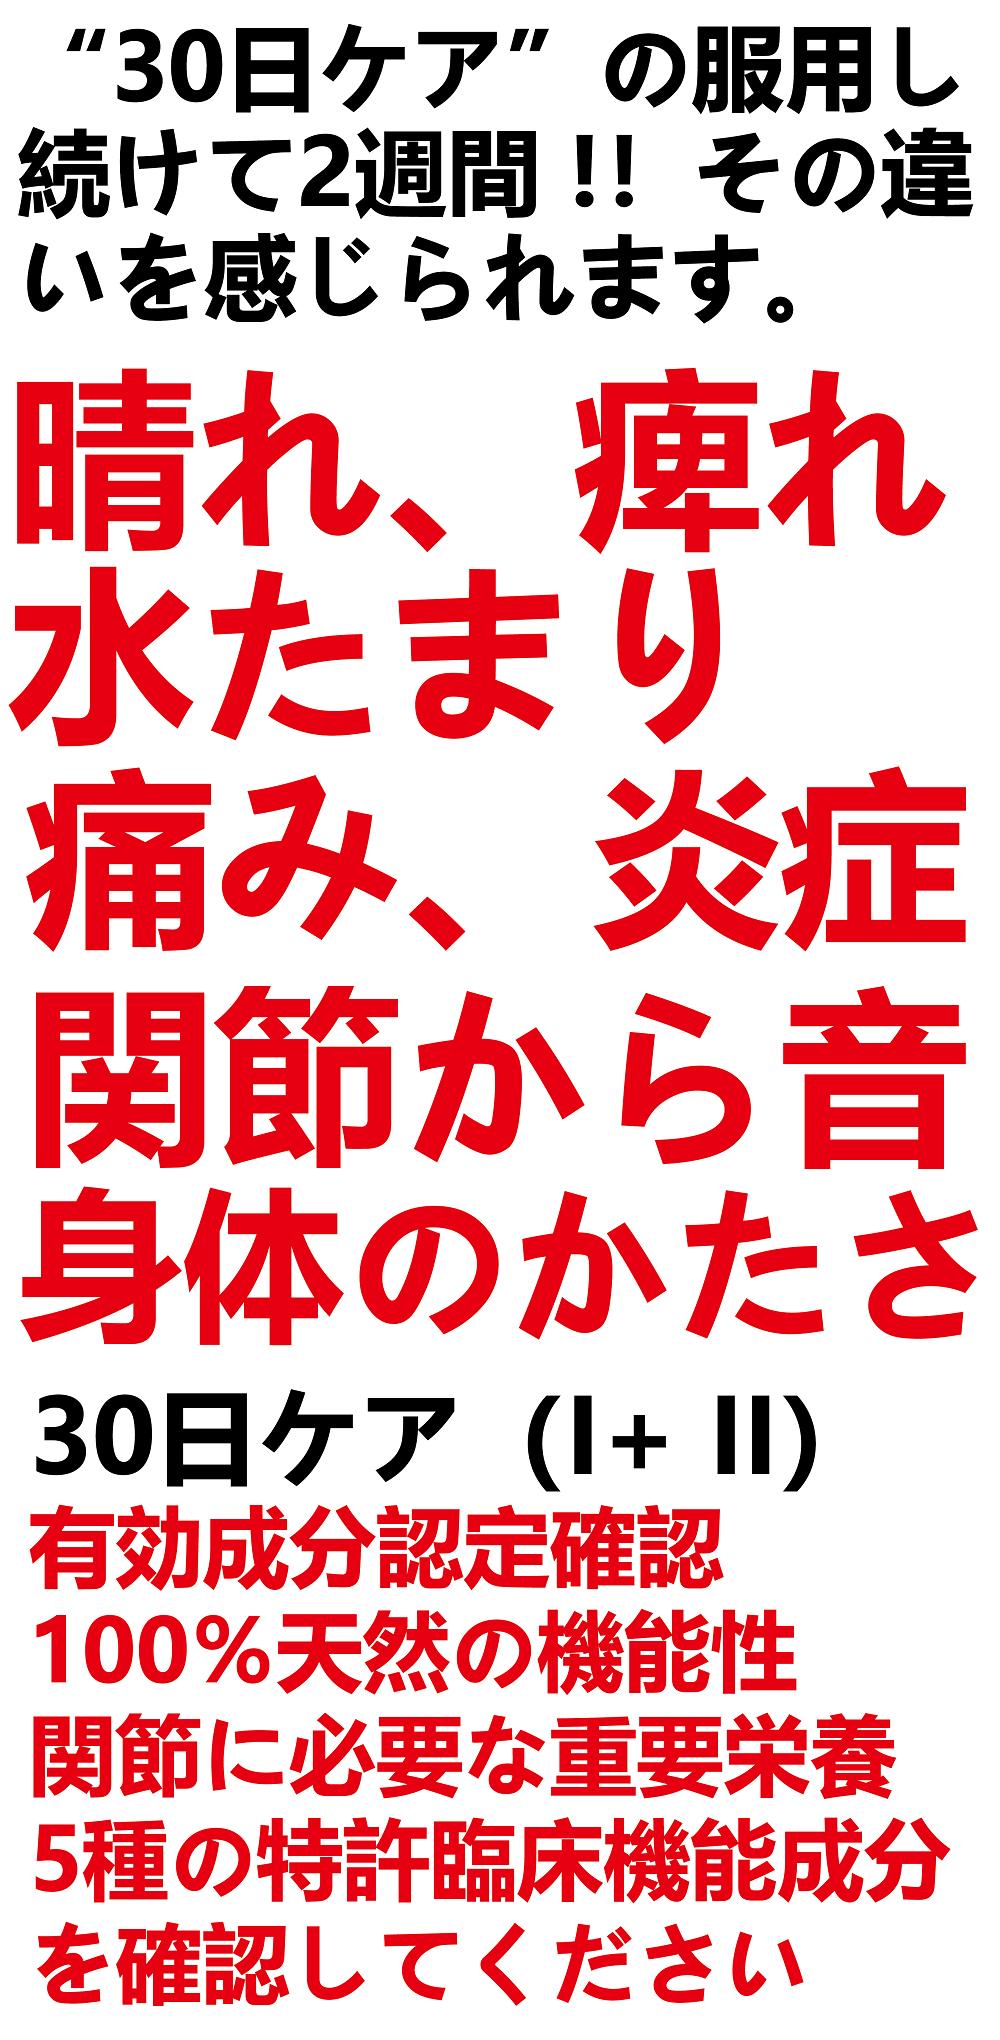 30days.JP Webpage.2.png